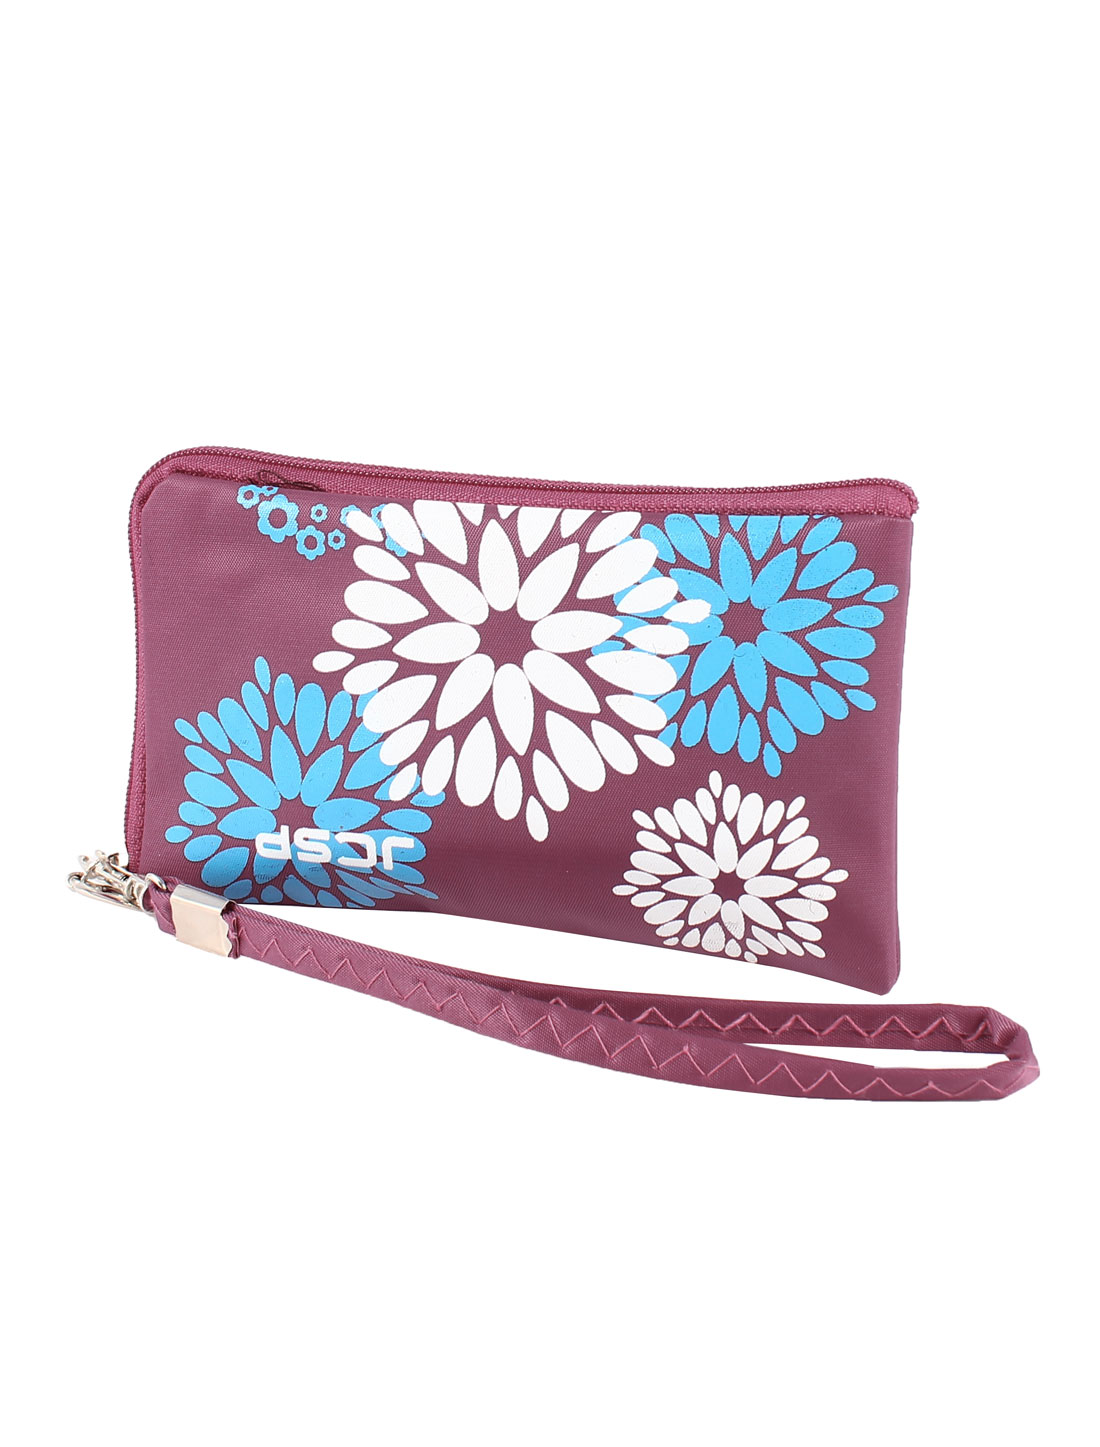 Flower Pattern Detachable Strap Zipper Pouch Purse Bag Holder Amaranth